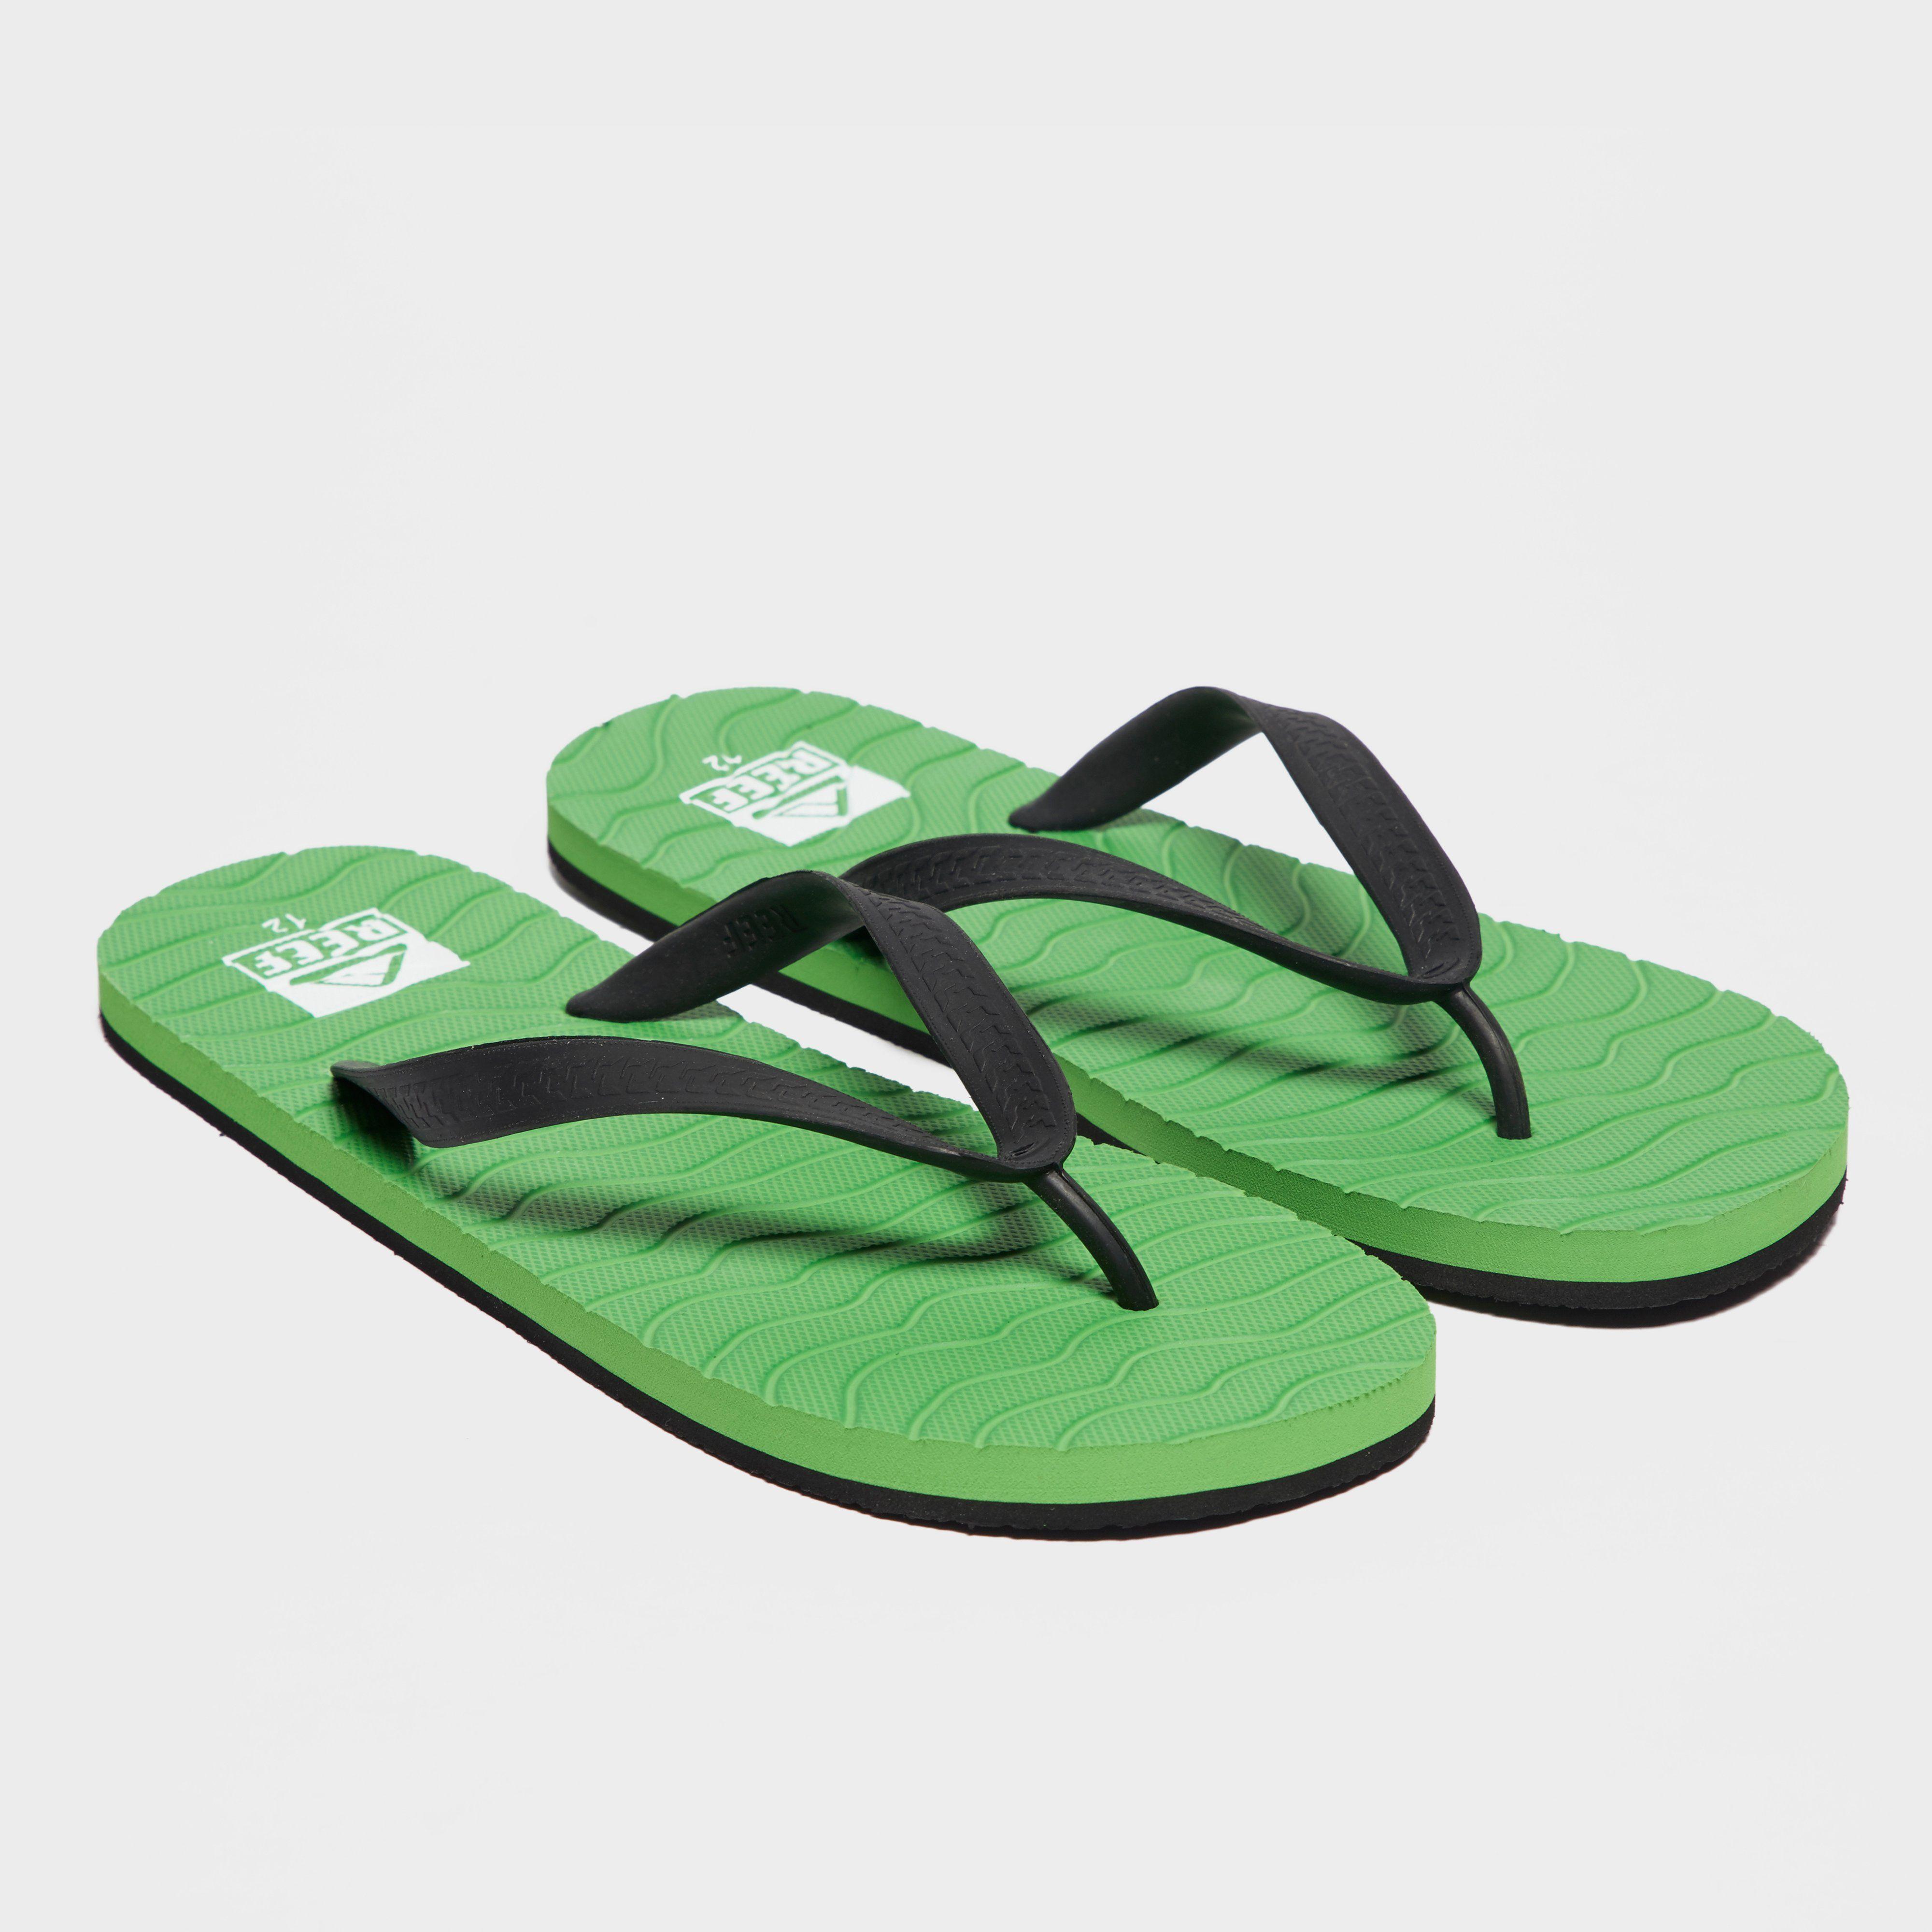 REEF Men's Chipper Sandals